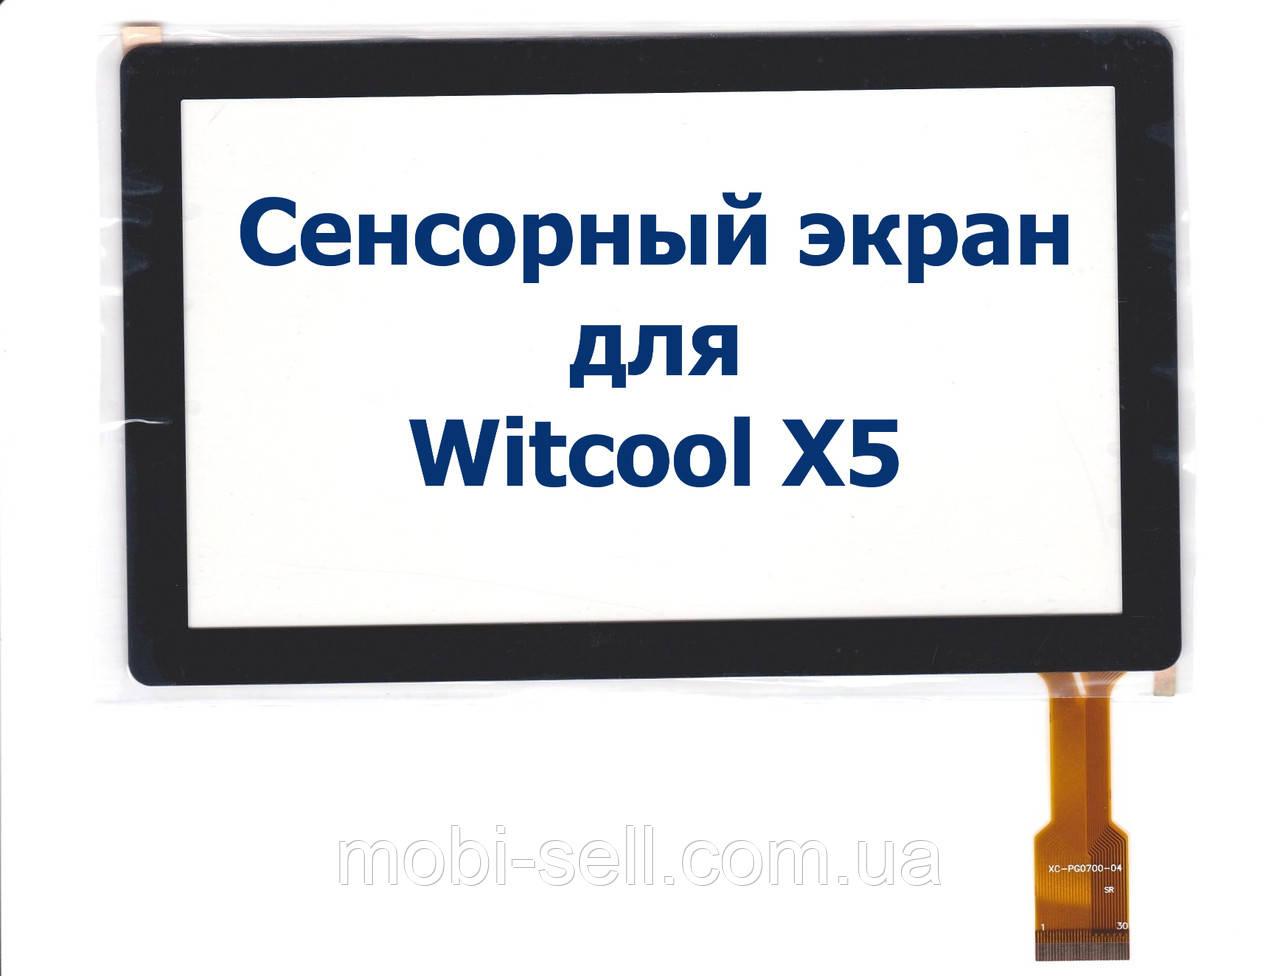 Сенсорный экран (тачскрин, сенсор) для Witcool X5